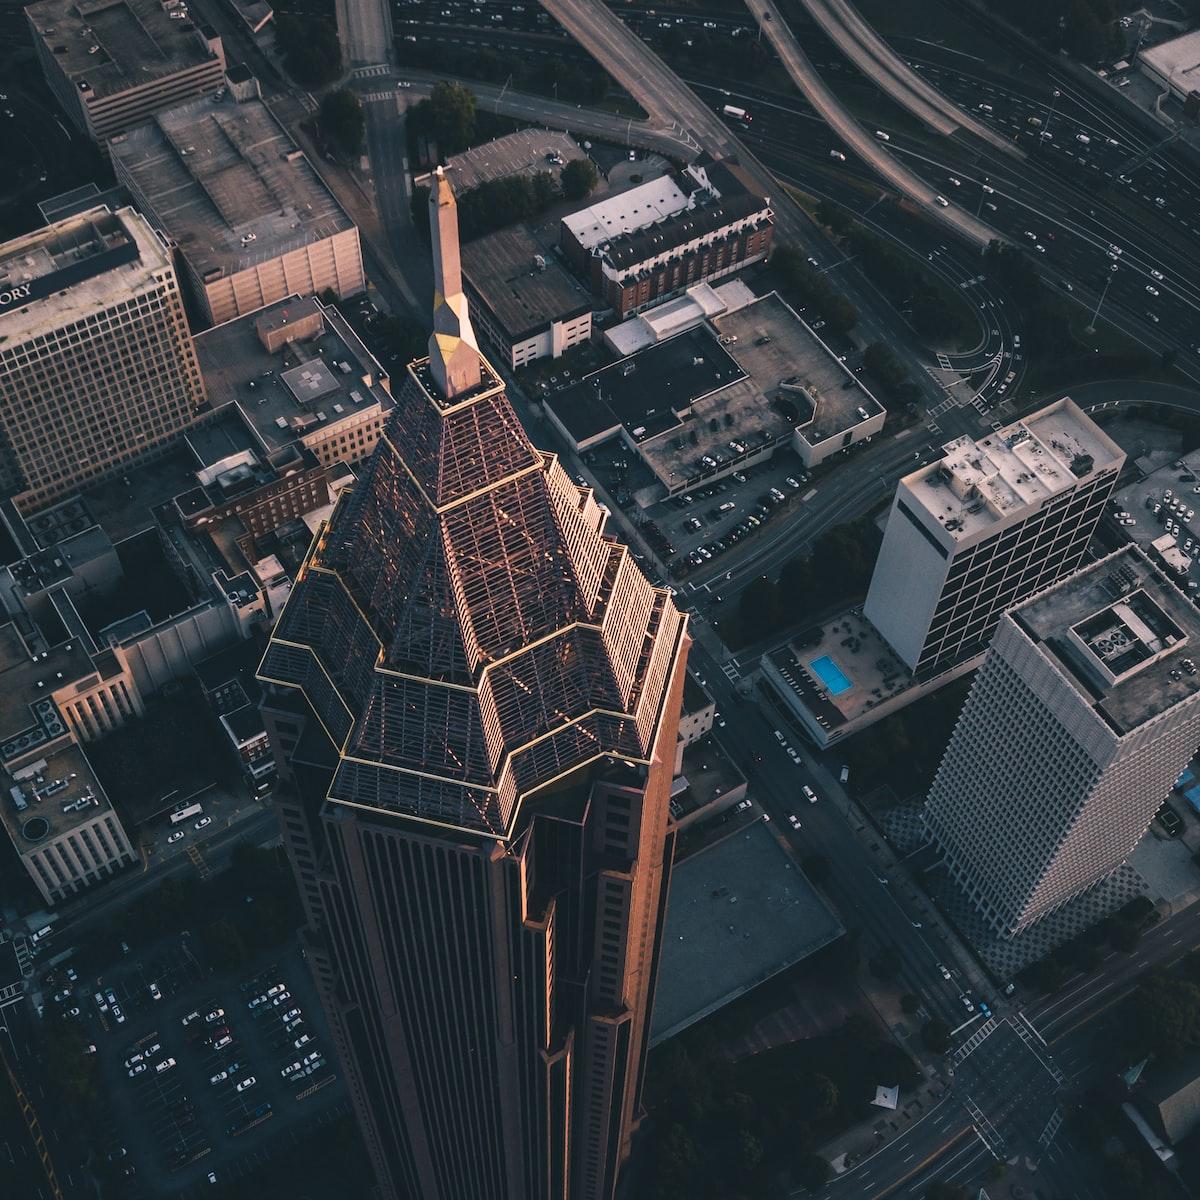 Overhead view of Atlanta